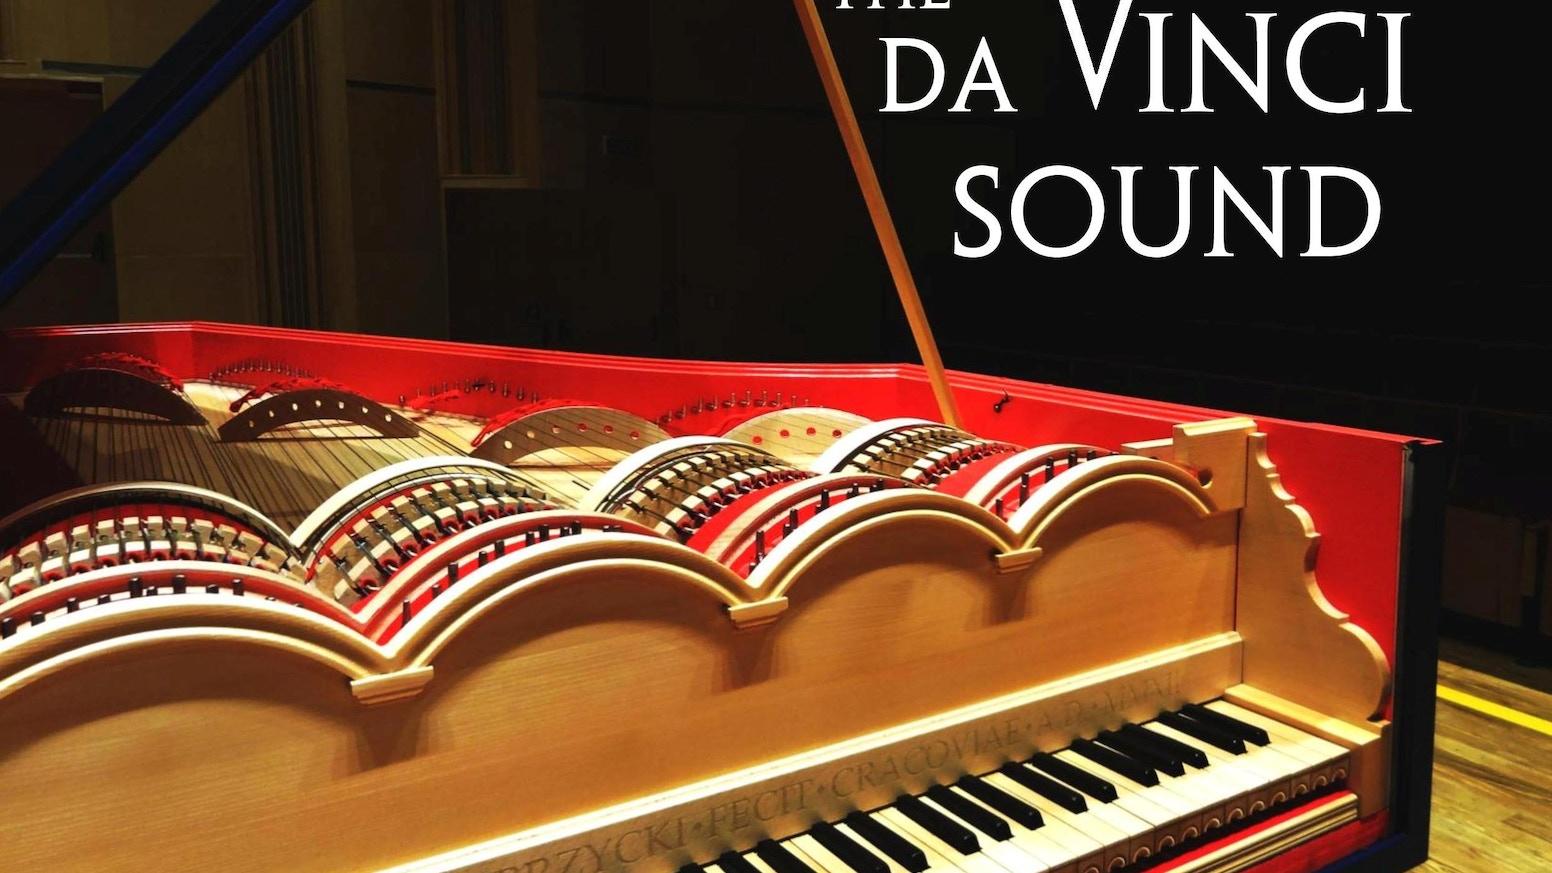 Viola Organista, the Leonardo's invention, got its voice after centuries of silence. Sławomir Zubrzycki is recording its first album.